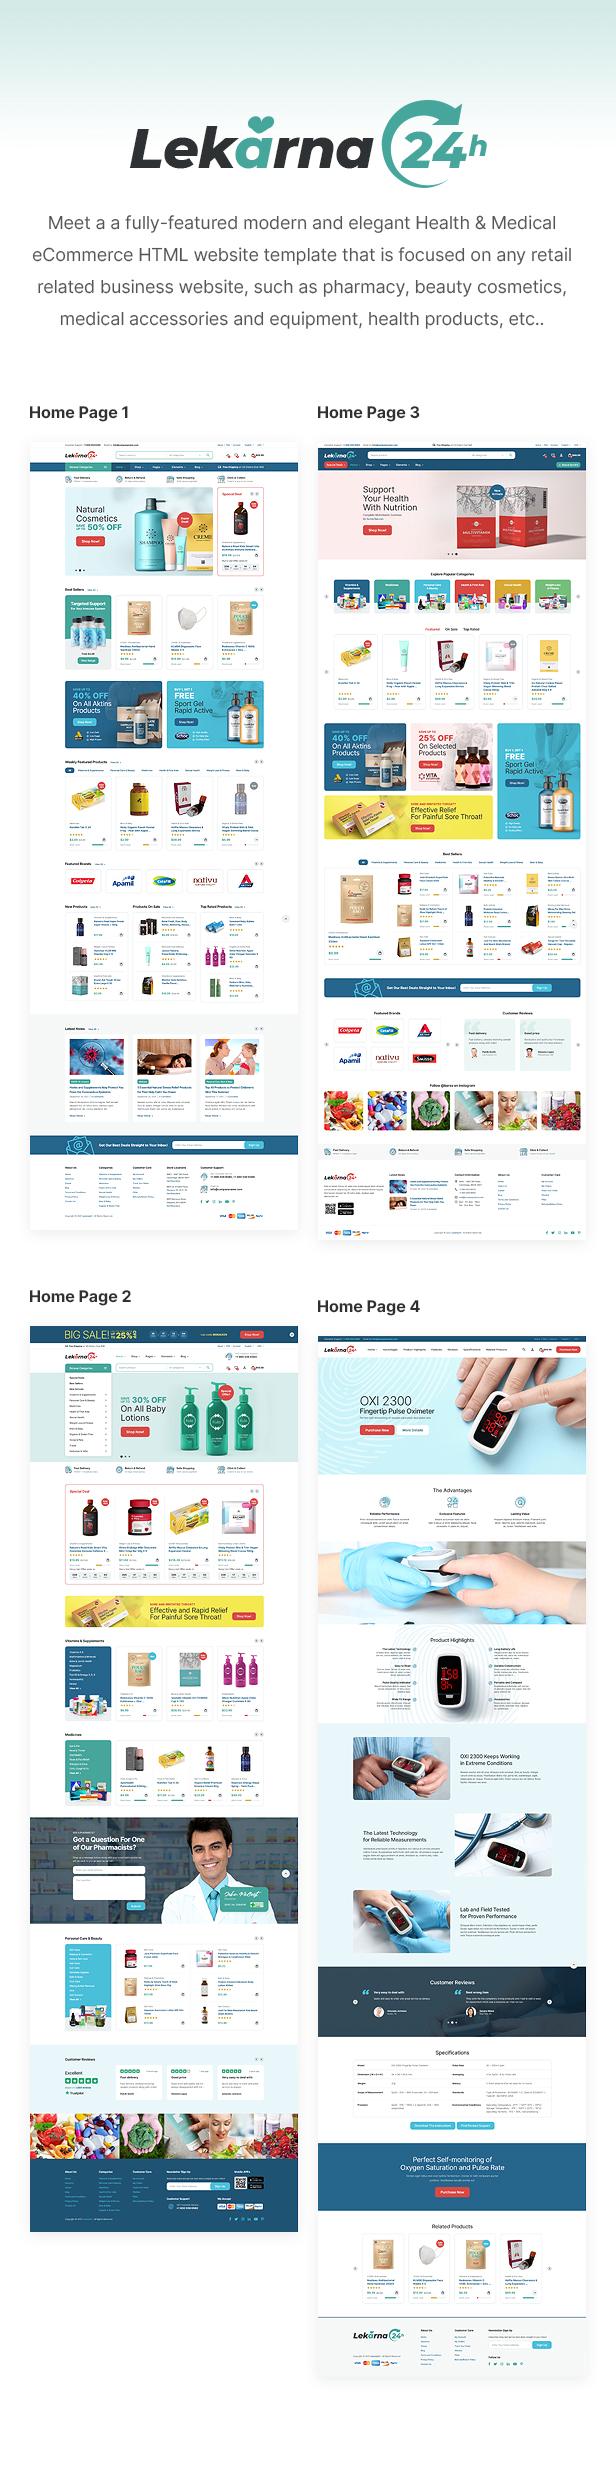 Lekarna24 - Health & Medical eCommerce HTML Website Template - 1